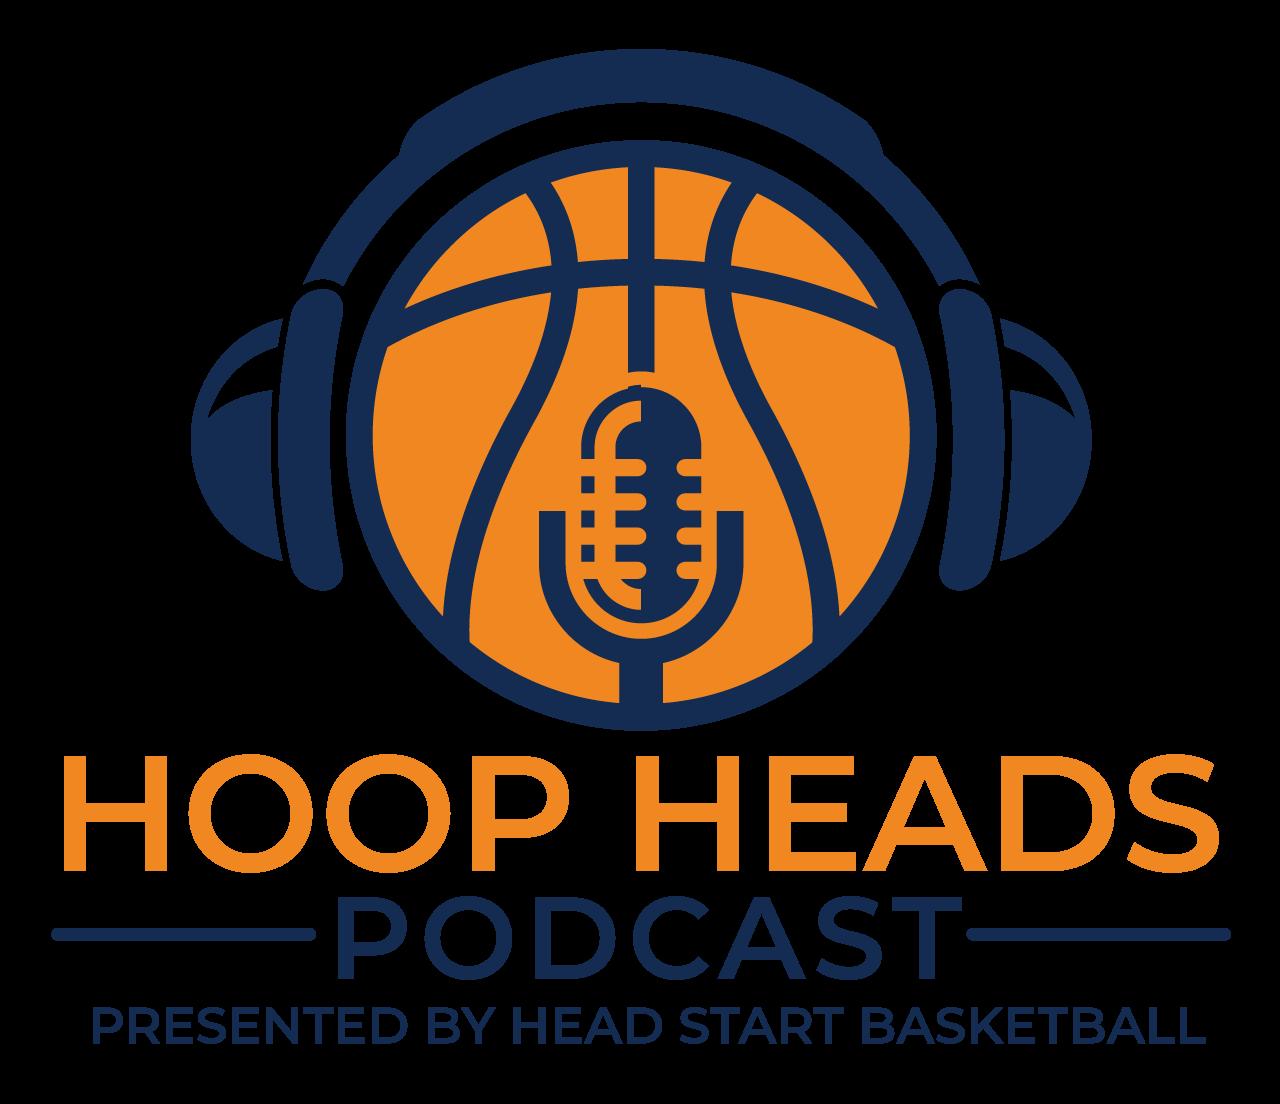 Hoop Heads Pod